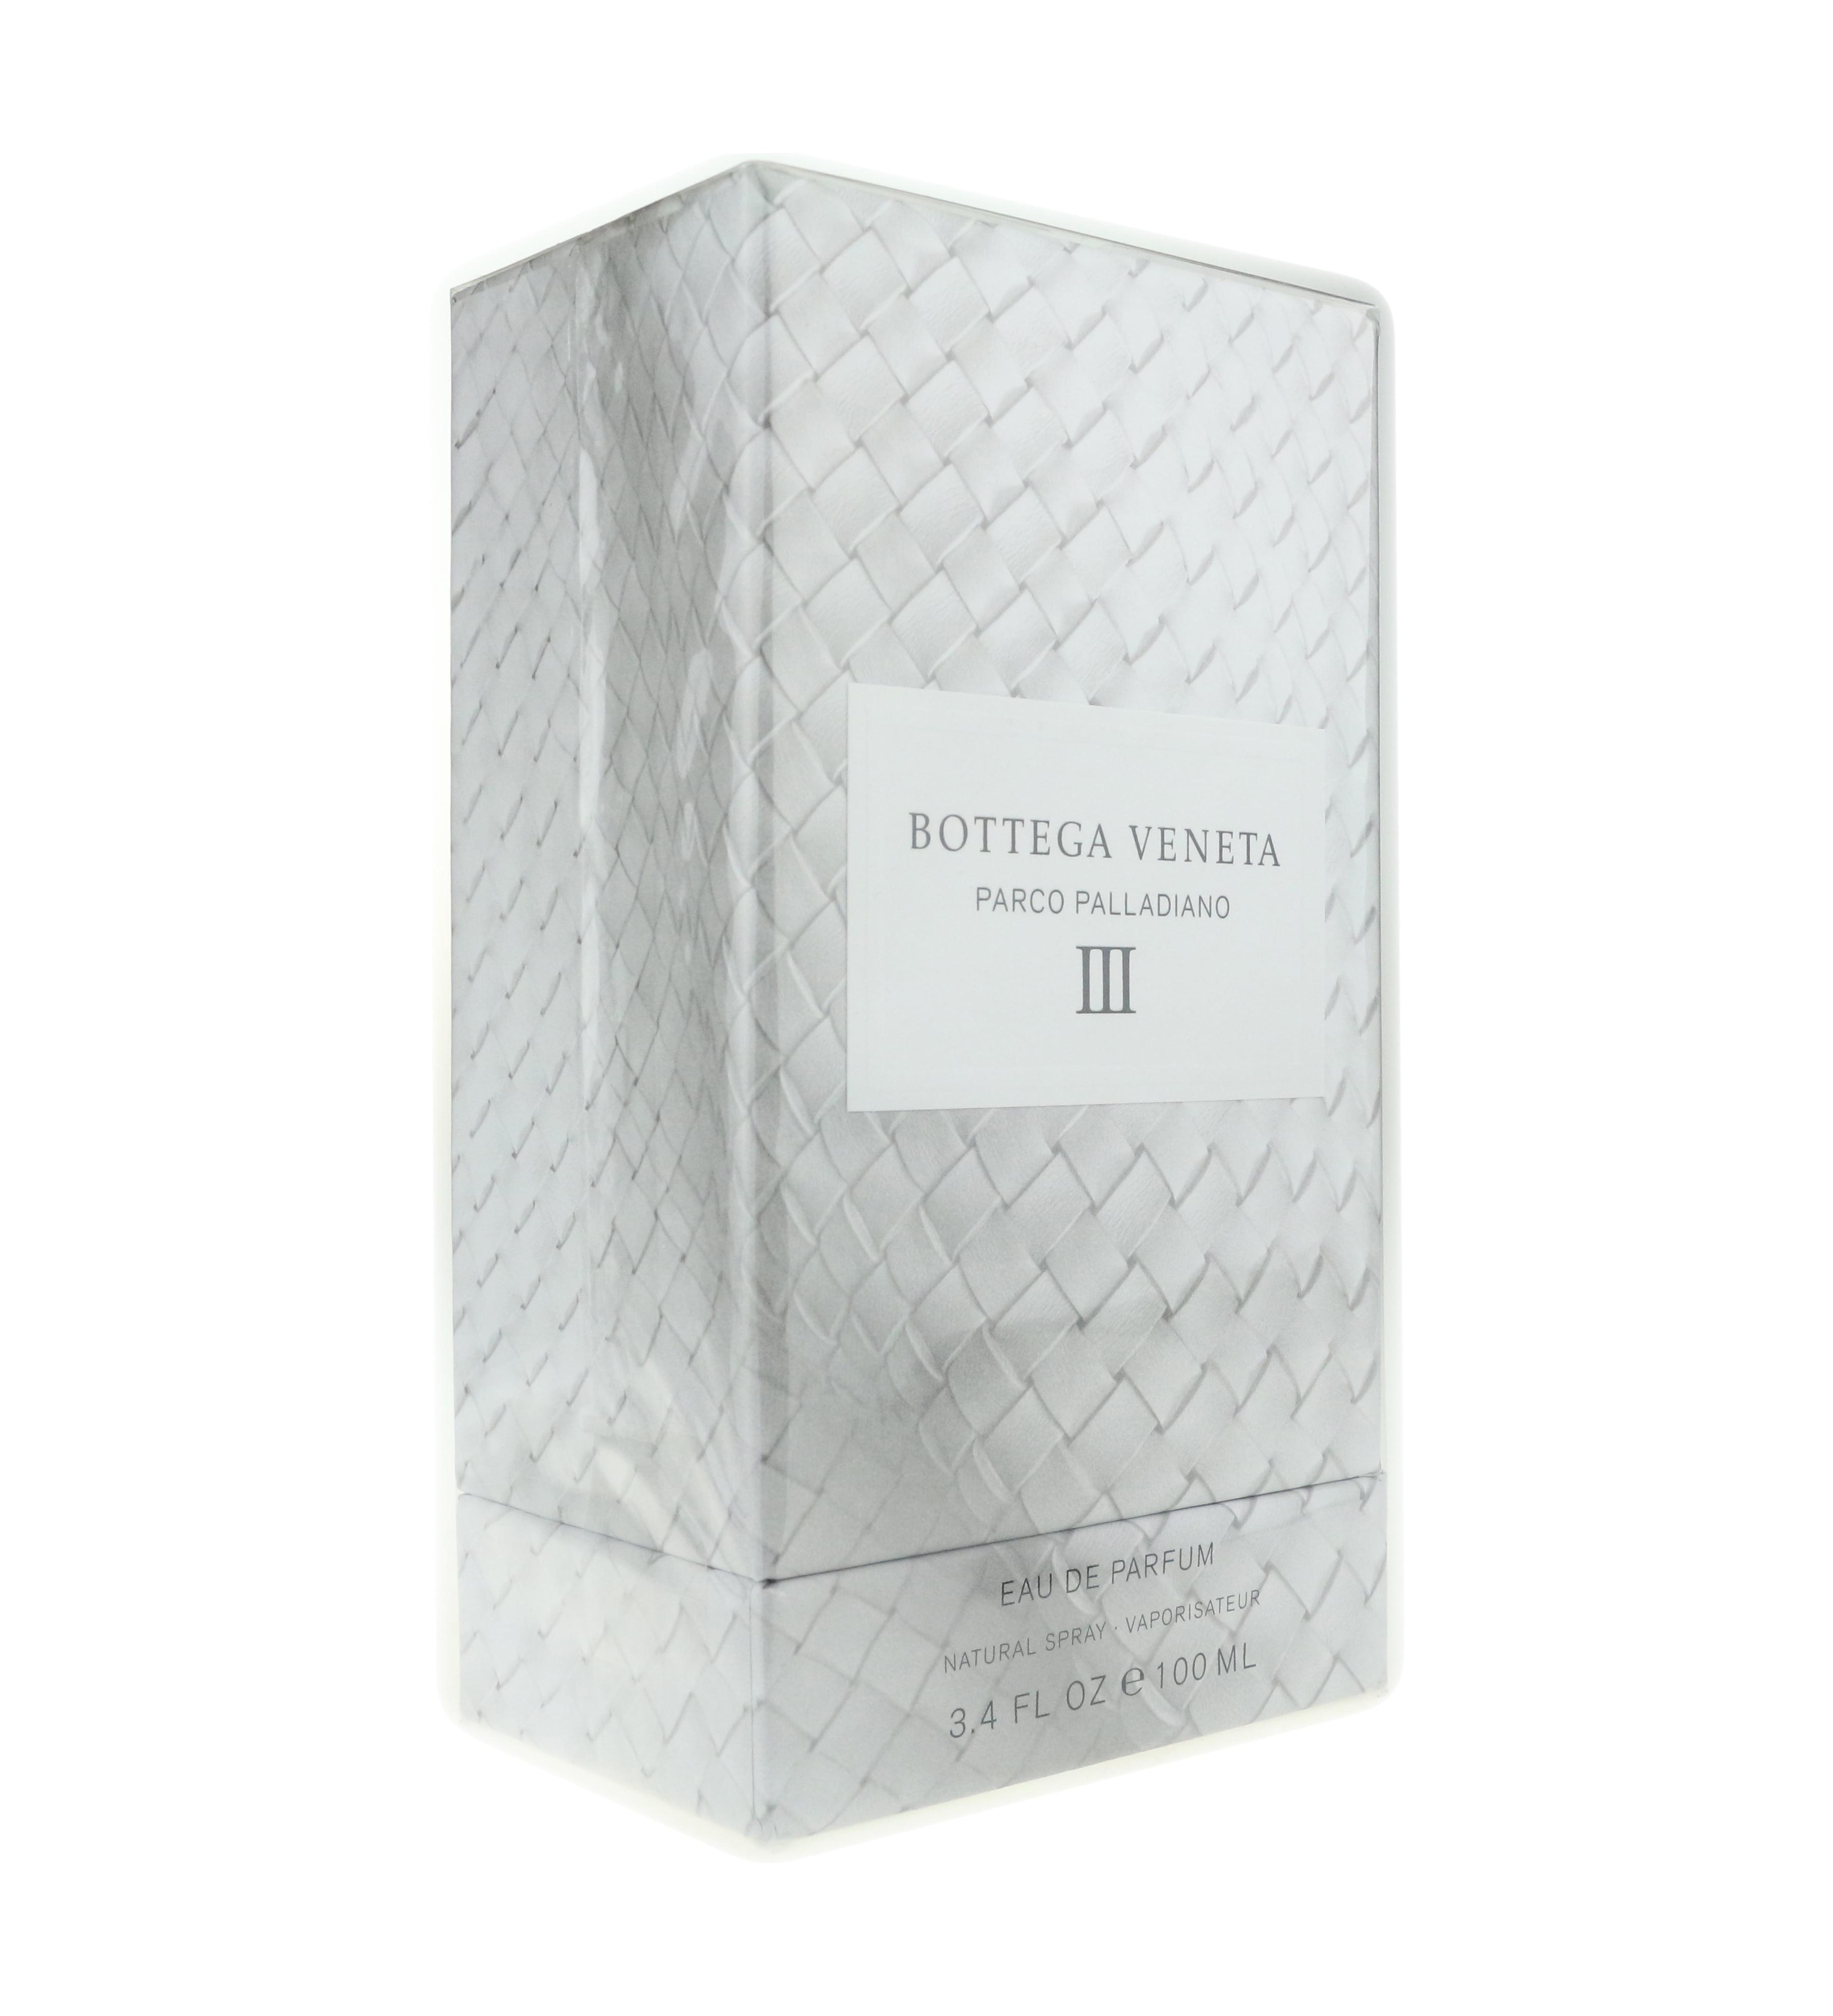 Bottega Veneta Parco Palladiano III' Eau De Parfum 3.4oz/...